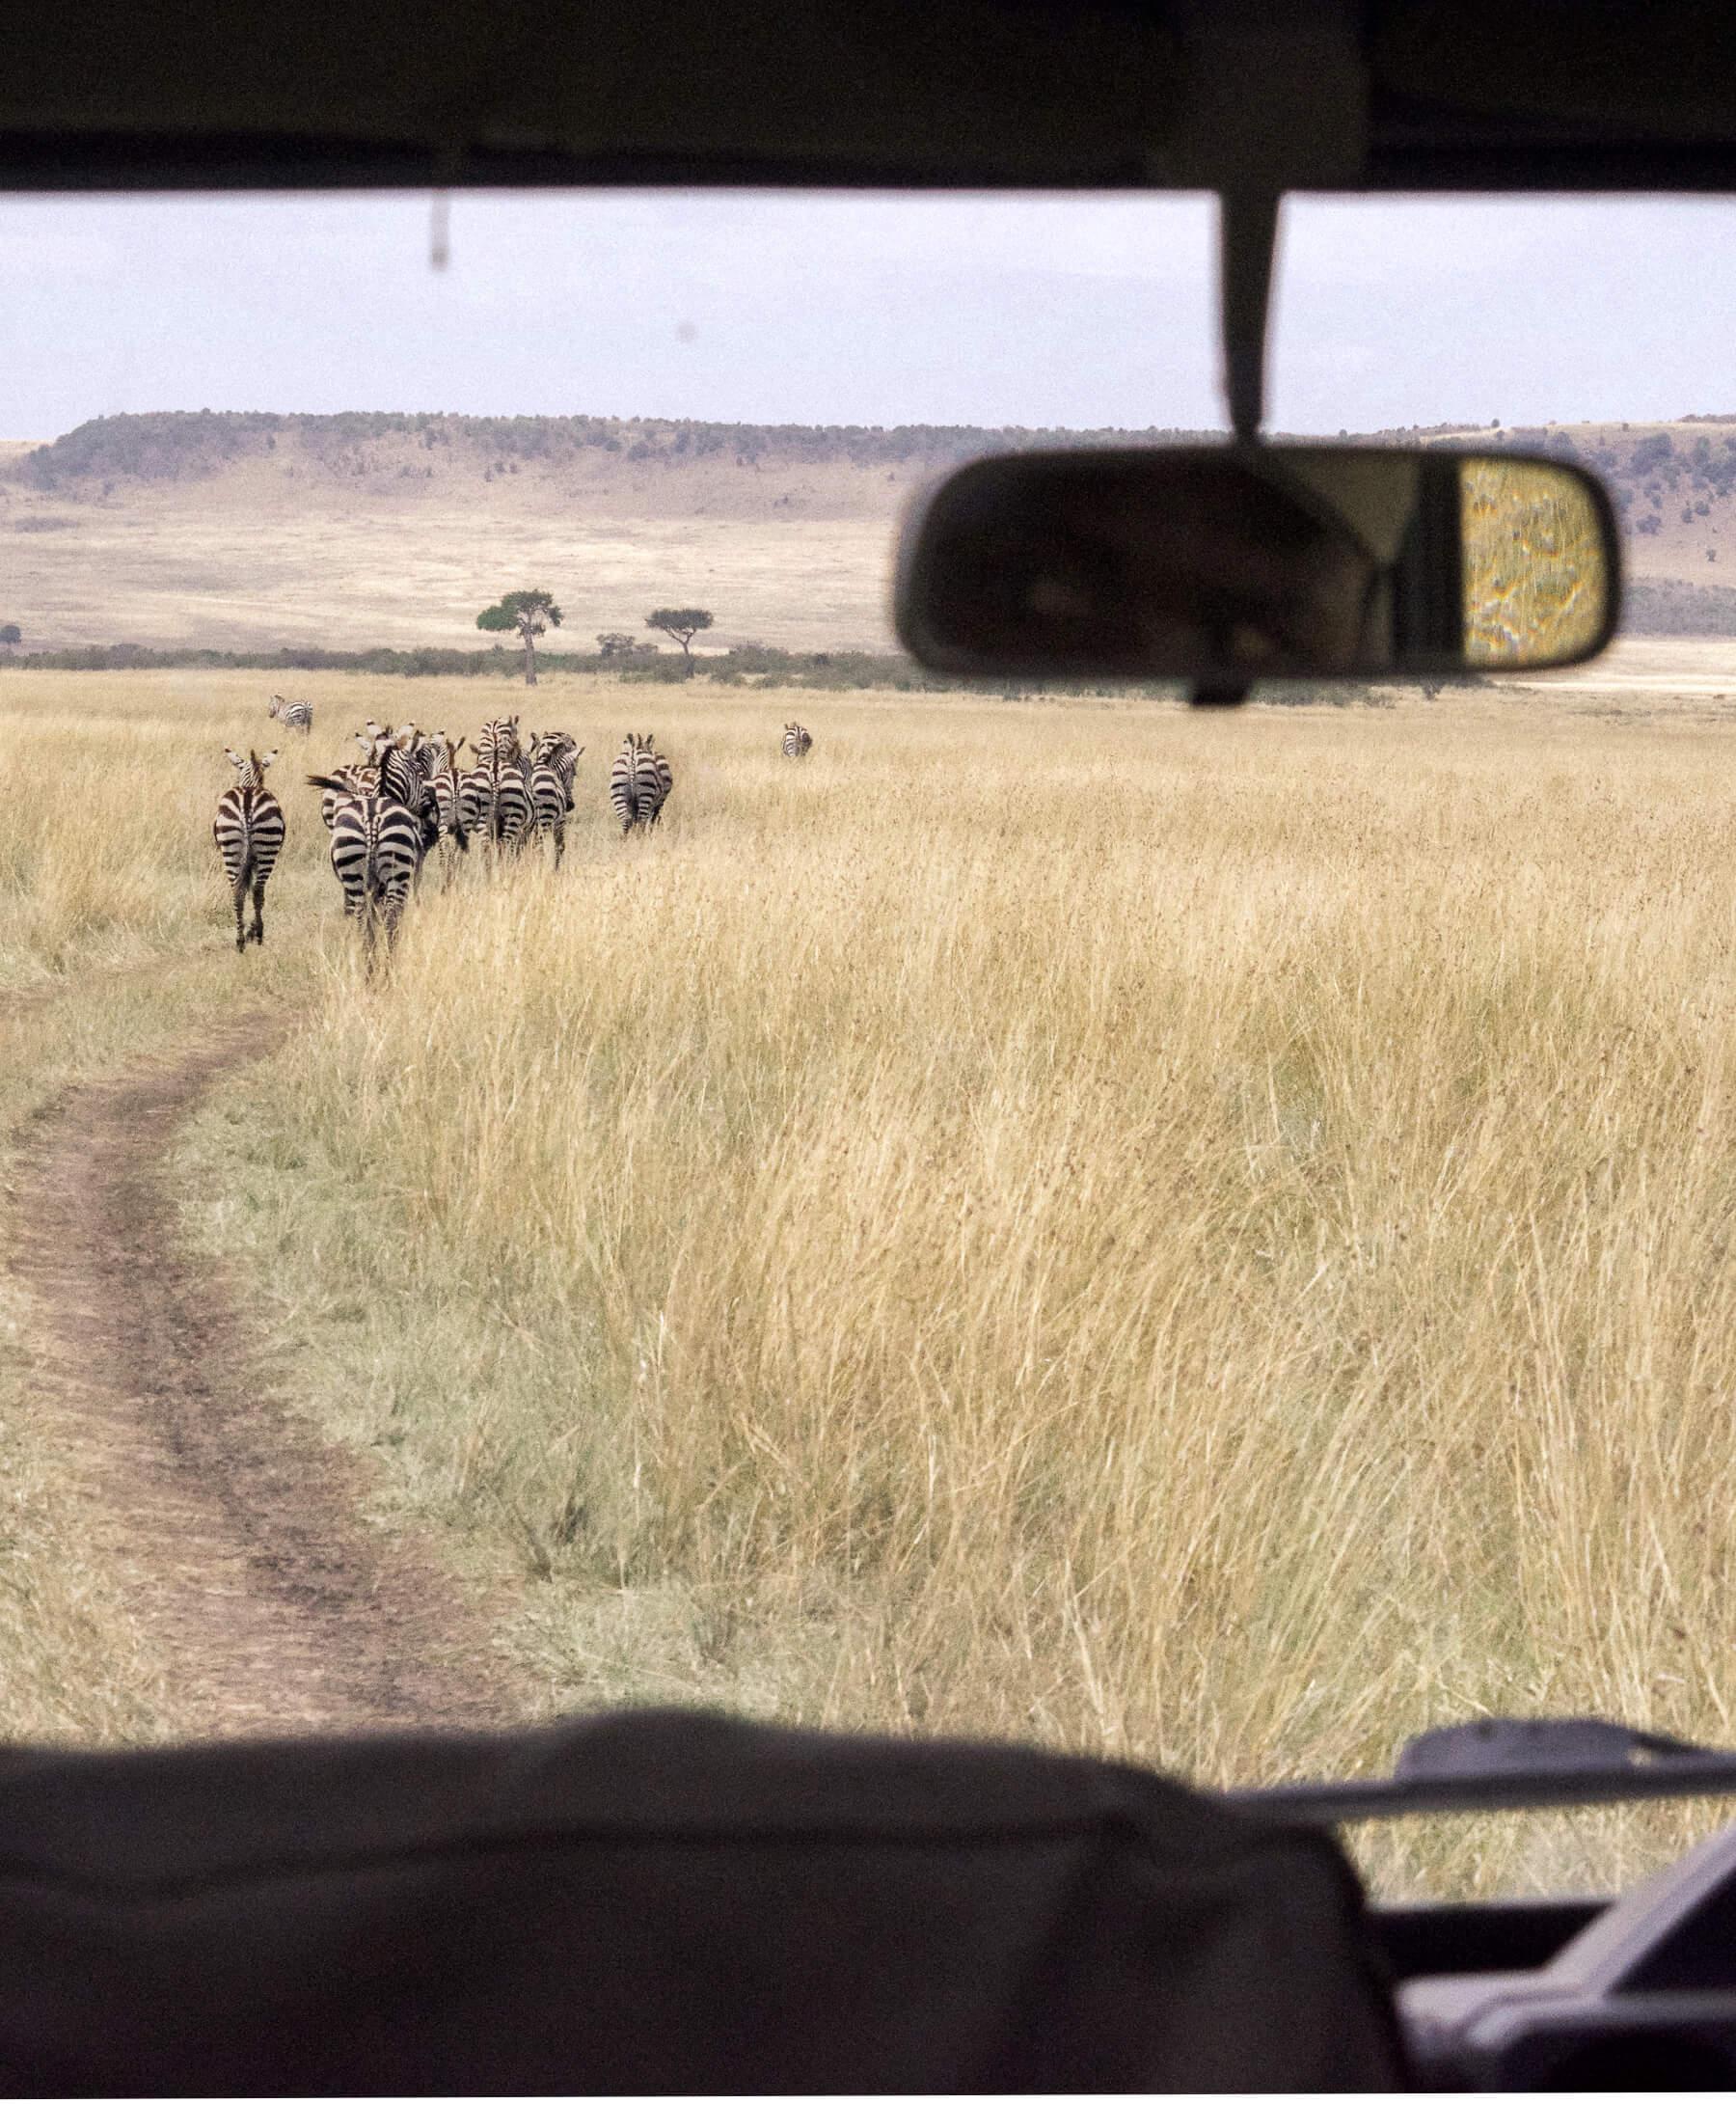 Zebra running in front of Kenya Safari vehicle in the Maasai Mara